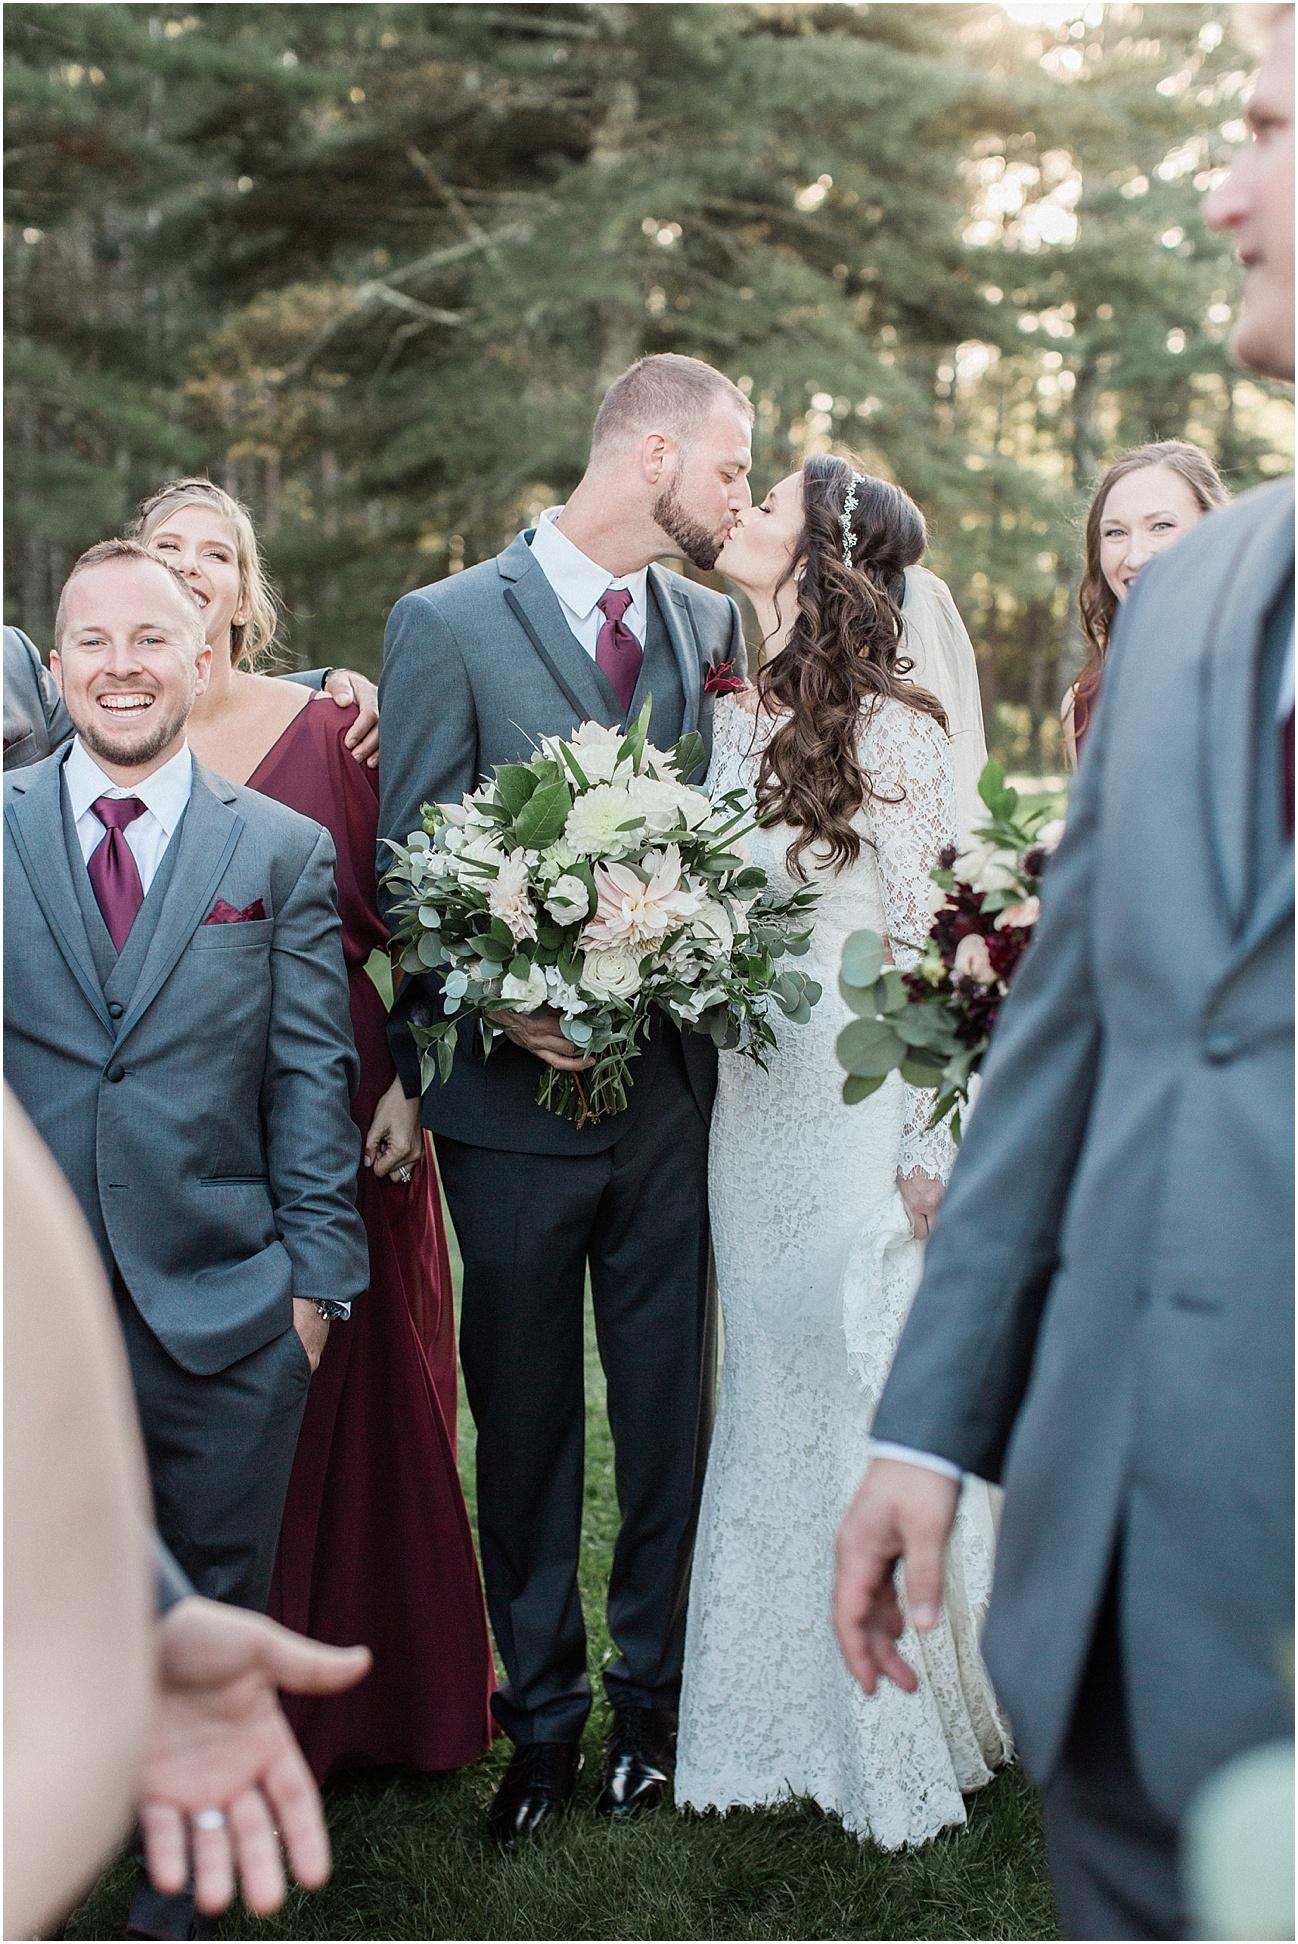 christina_frank_the_pavilion_at_pine_hills_fall_wine_cape_cod_boston_wedding_photographer_meredith_jane_photography_photo_1241.jpg